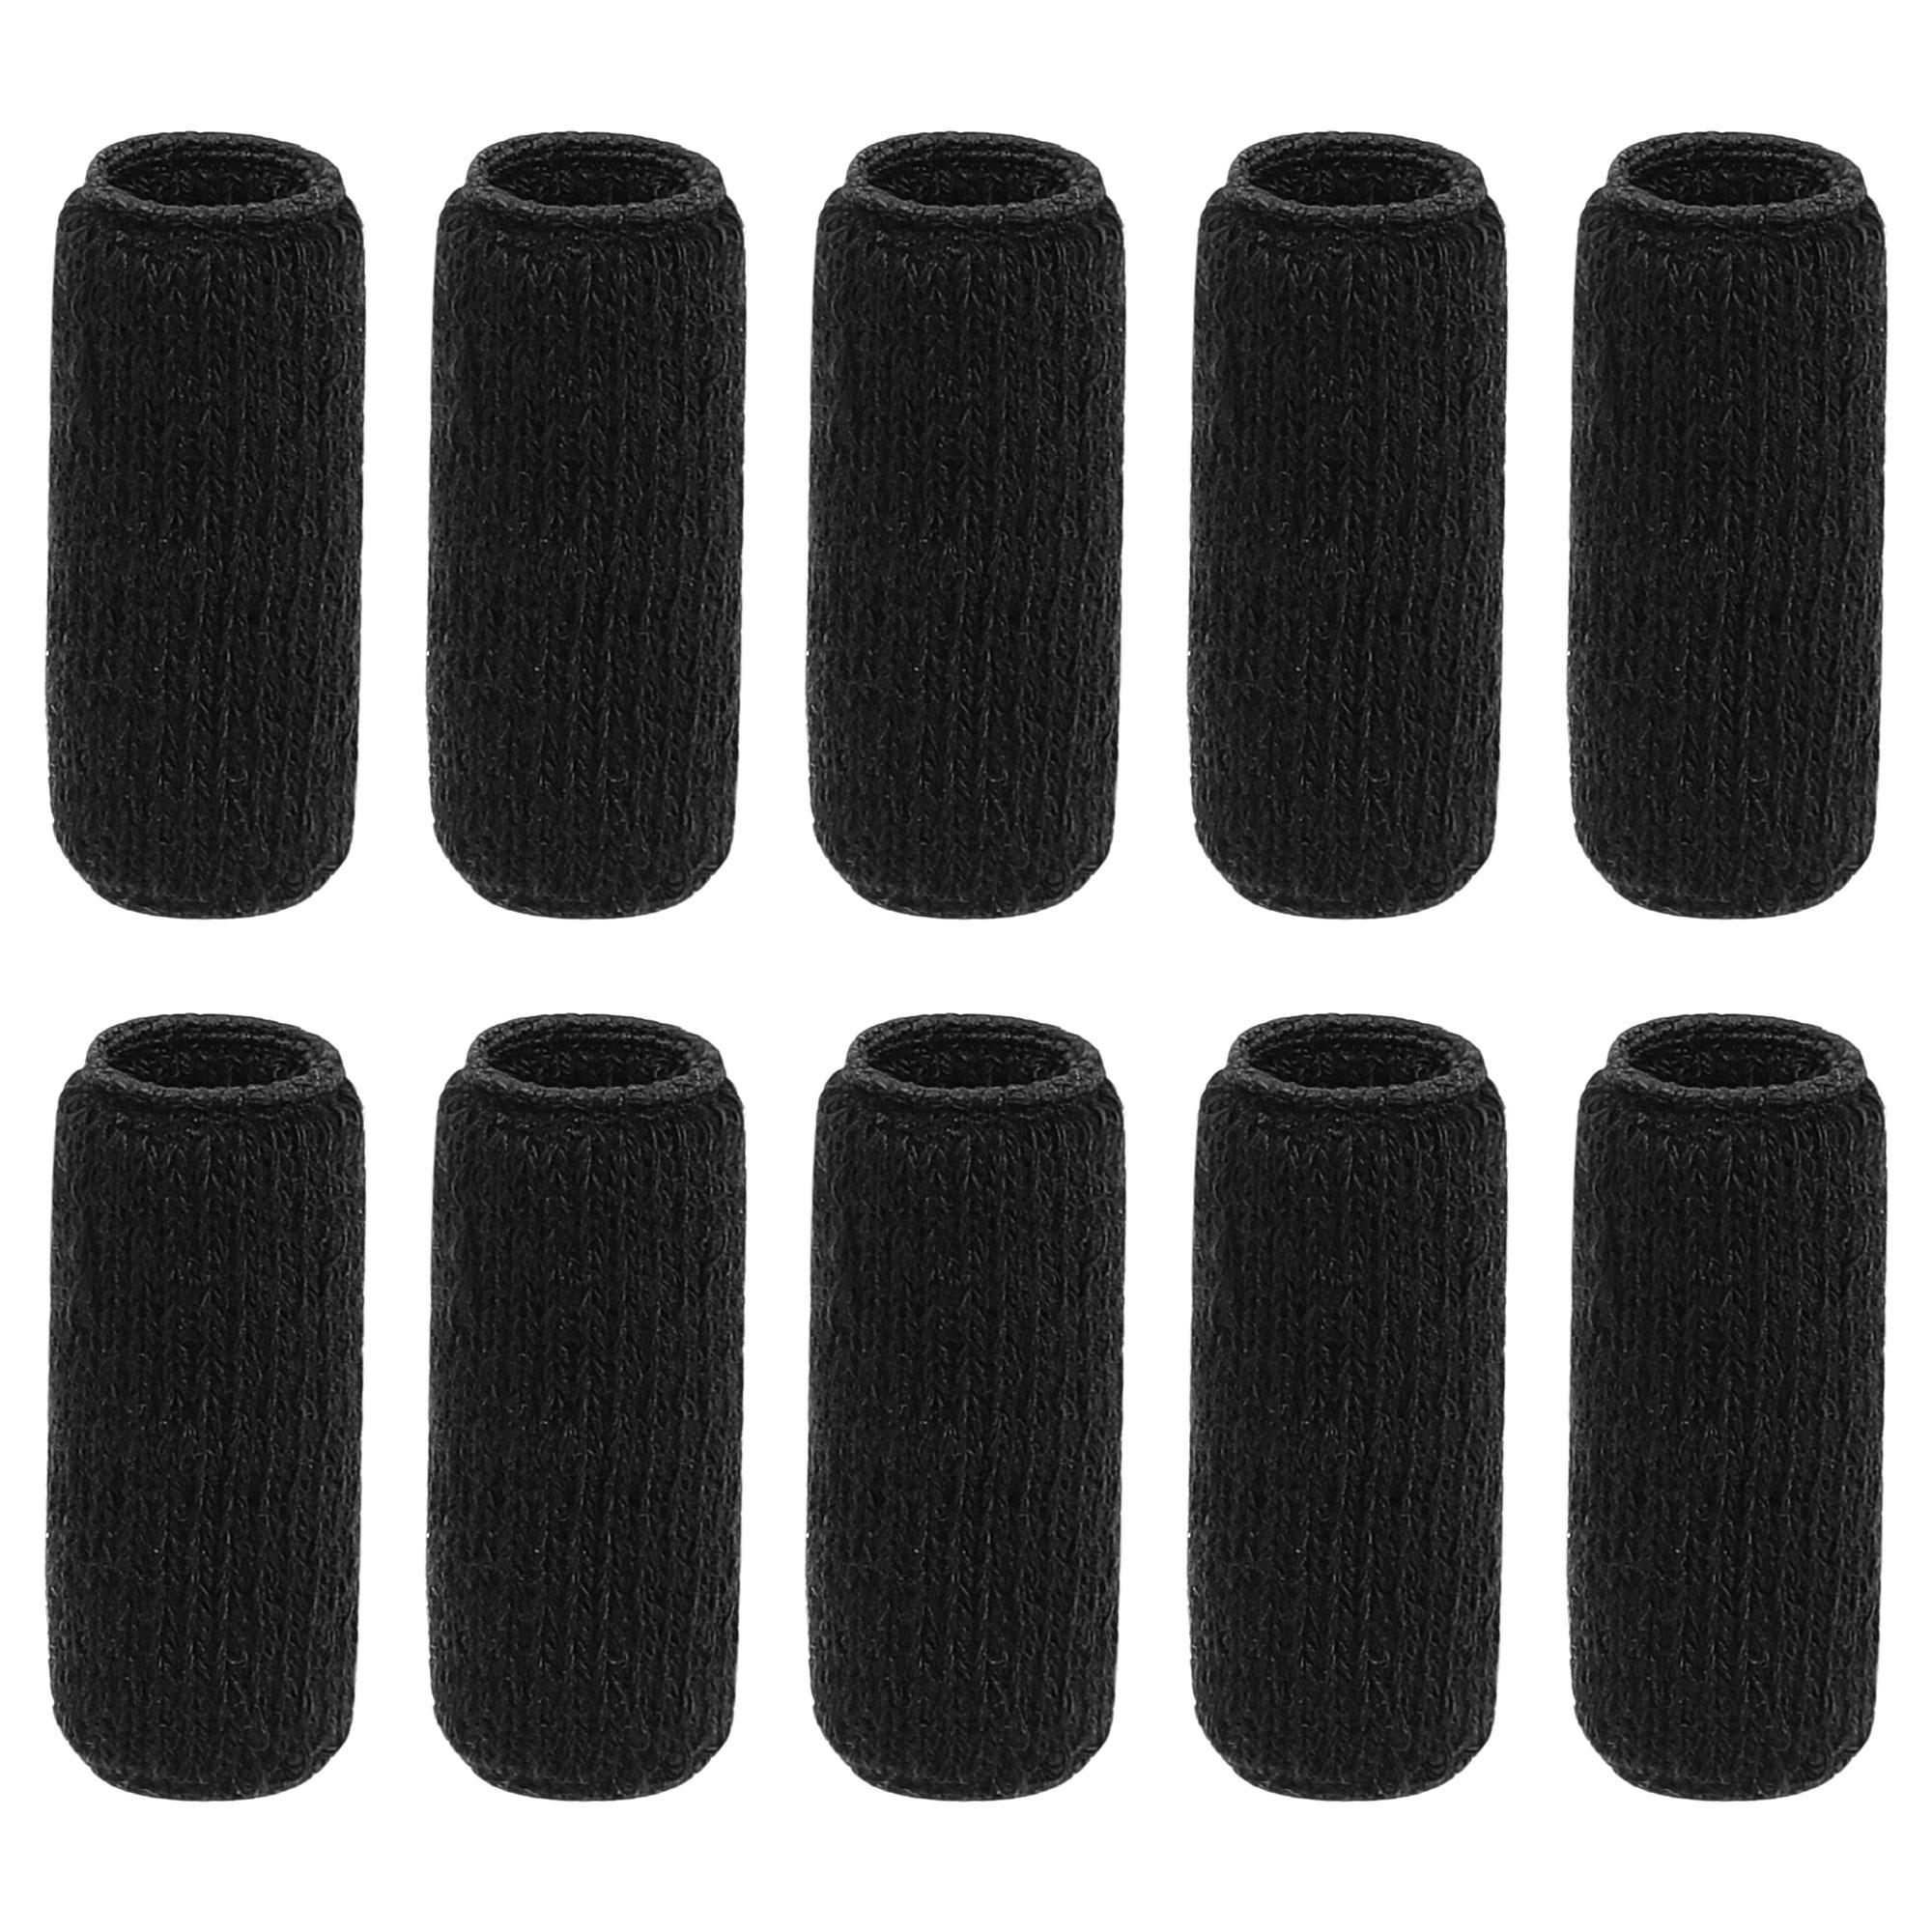 10 Pcs Black Sports Elastic Hand Finger Sleeve Protector